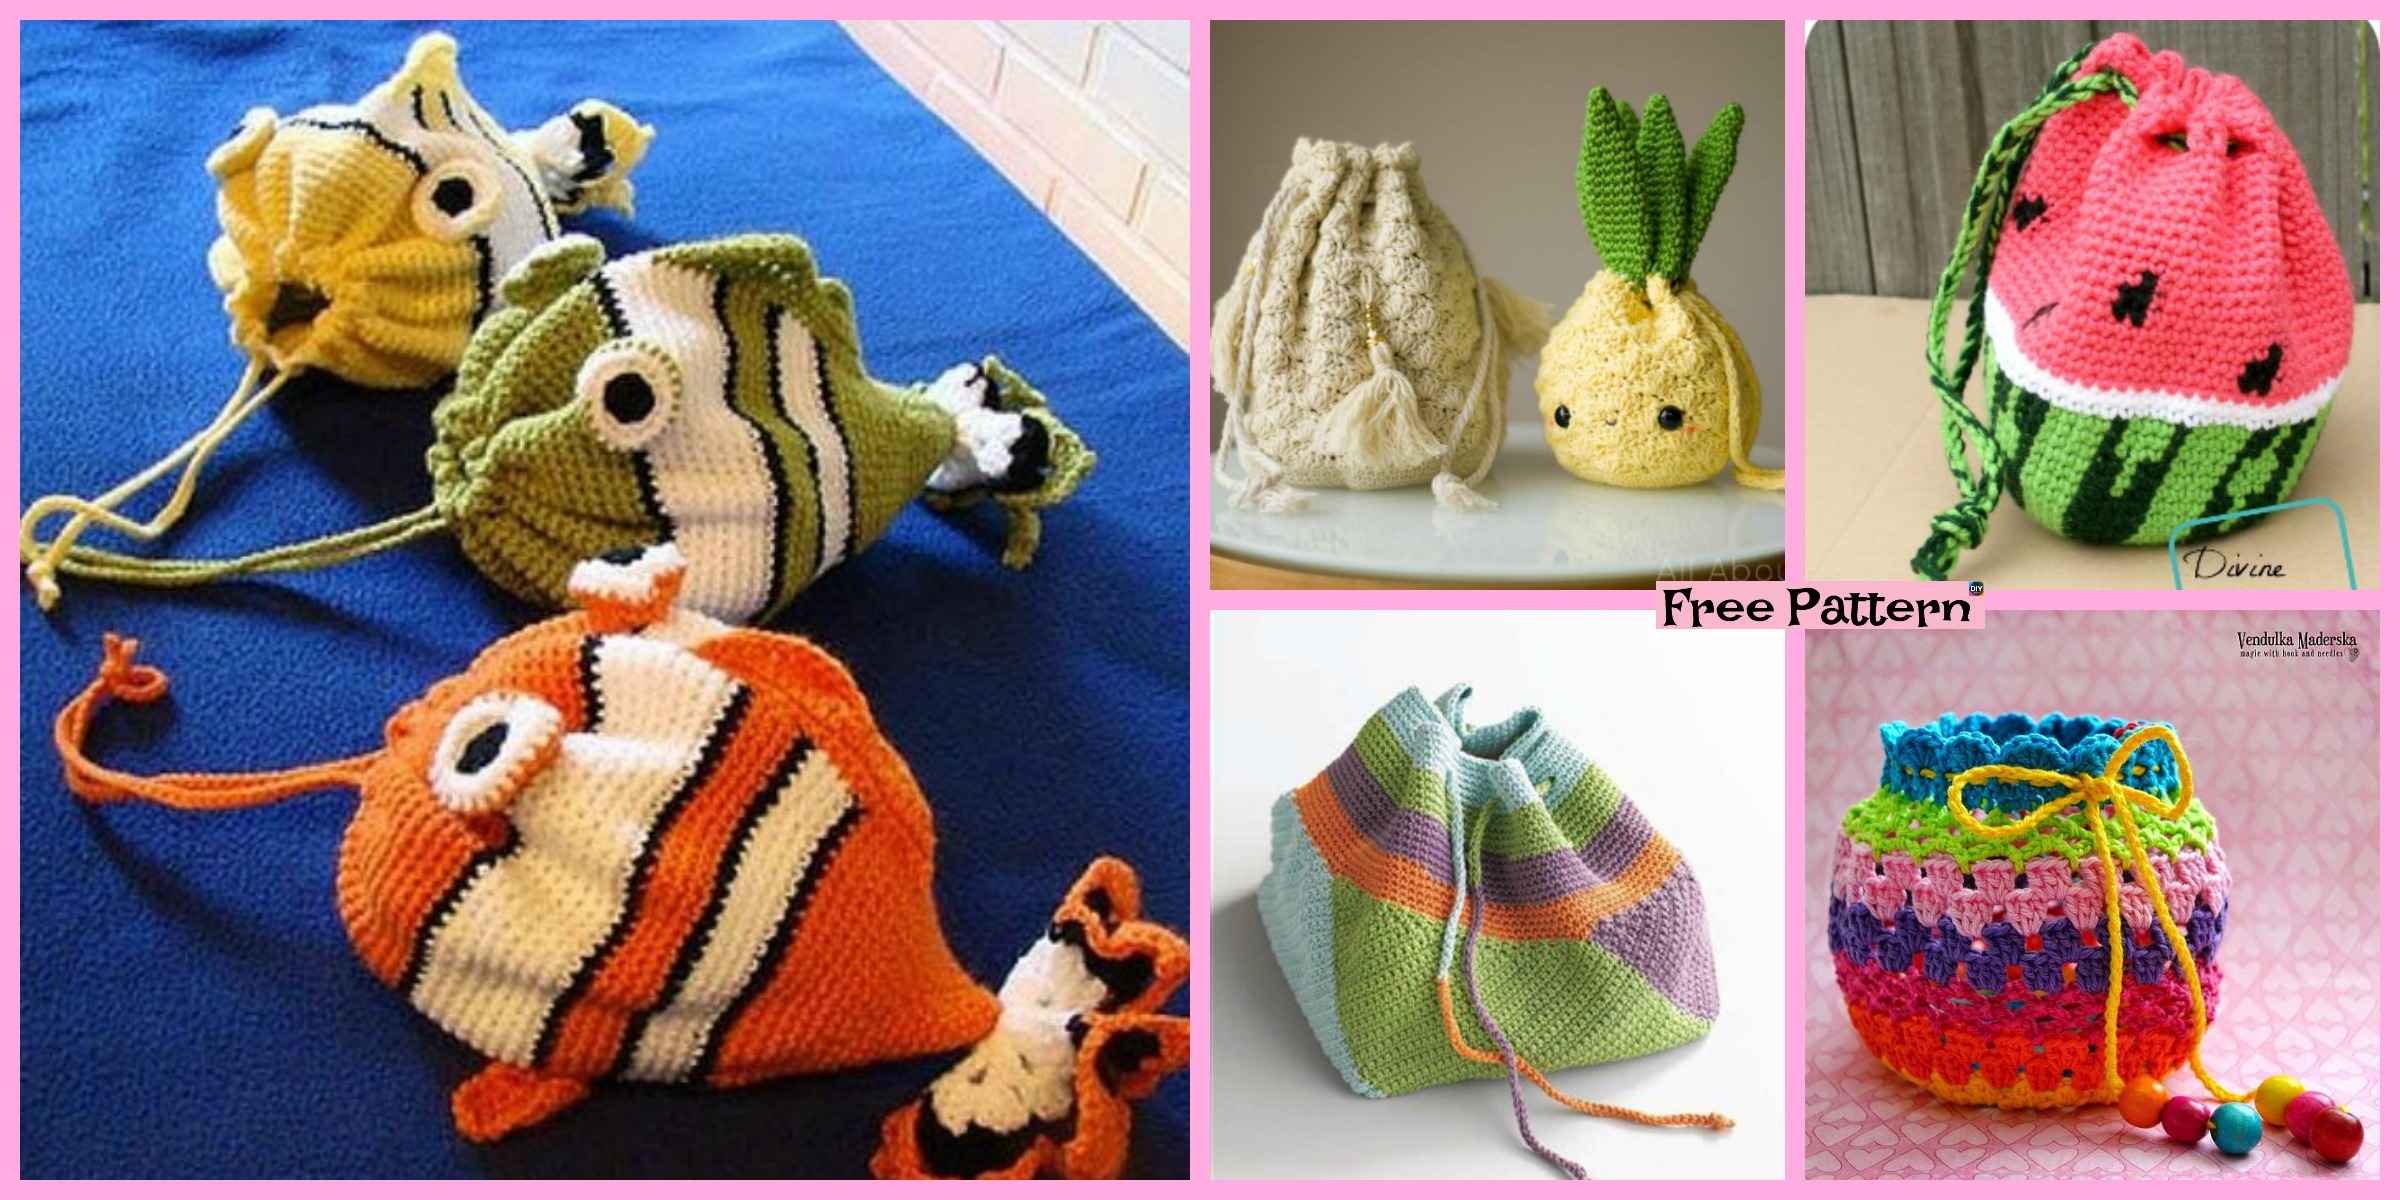 15 Crochet Drawstring Bag Free Patterns